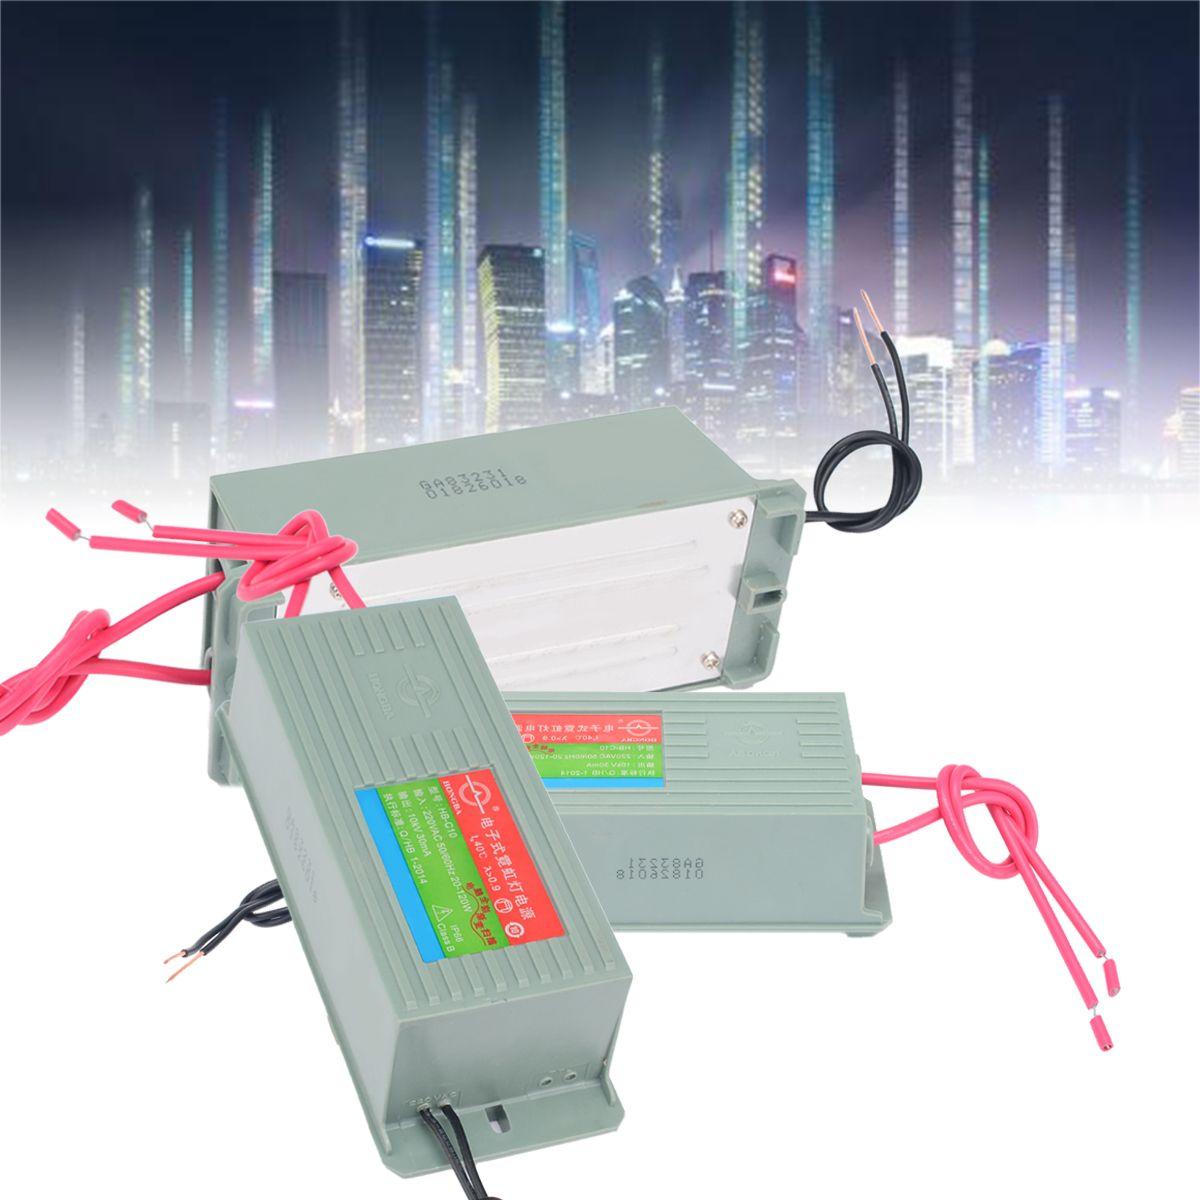 High Quality Neon Electronic Transformer Neon Power Supply Rectifier HB-C10 10KV 30mA 20-120W